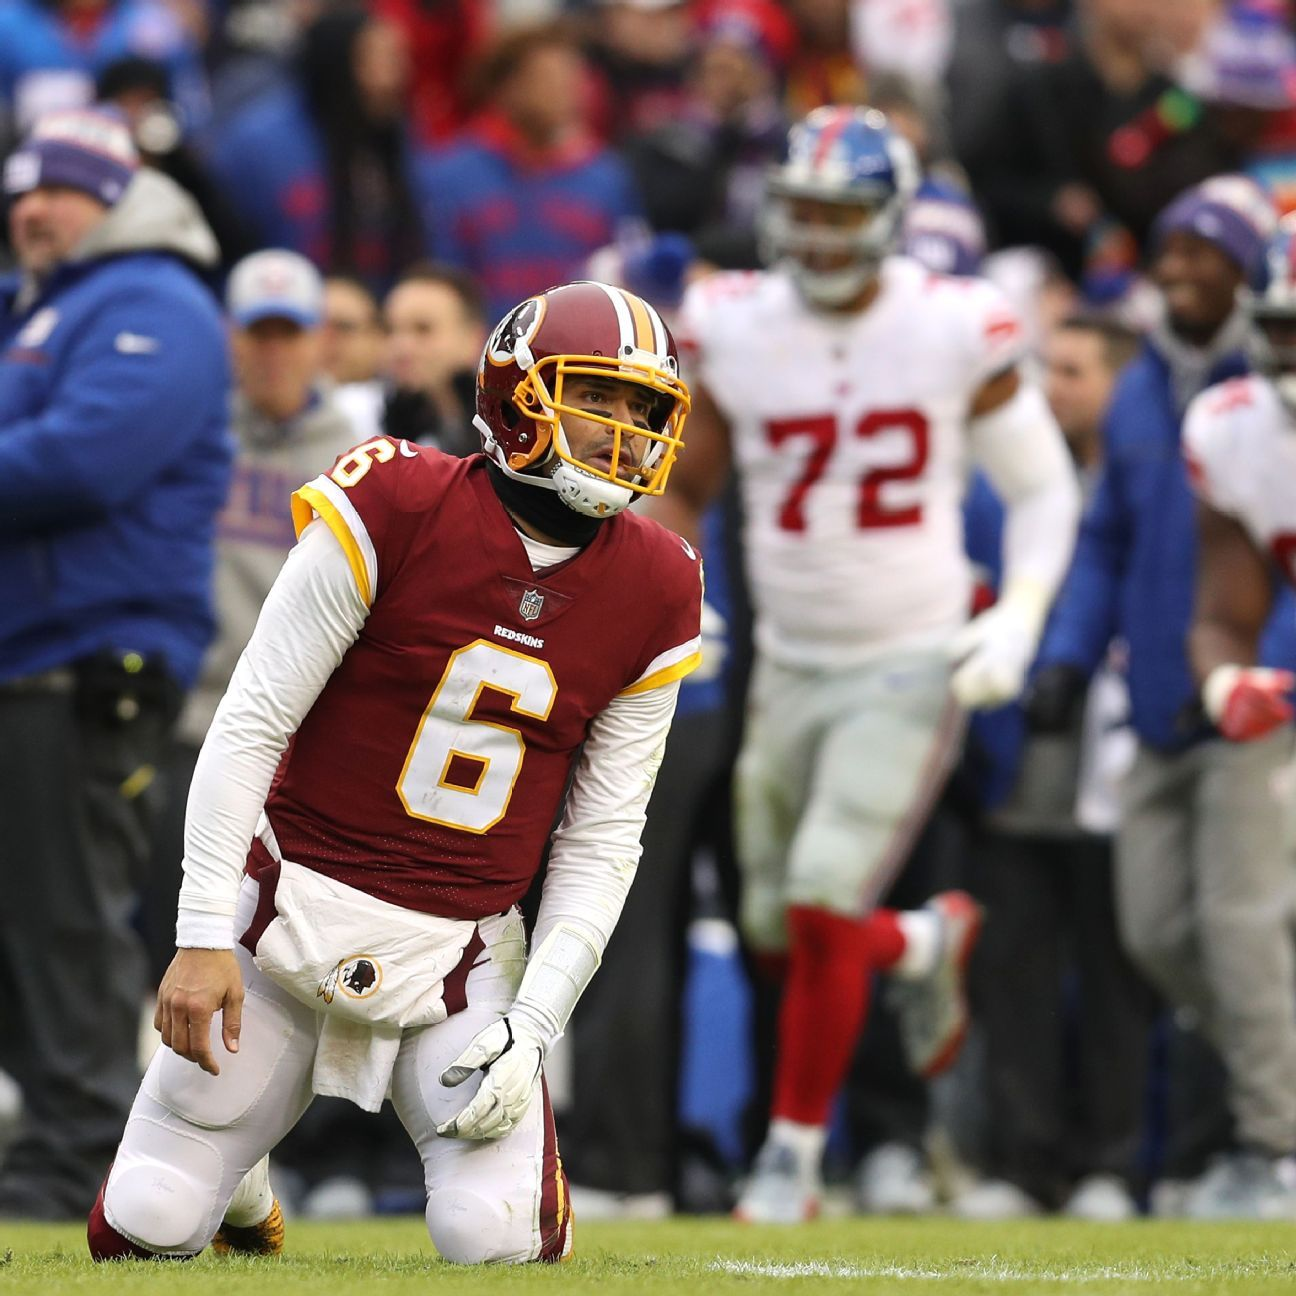 Week 14 overreactions: Has Tom Brady won his last Super Bowl?